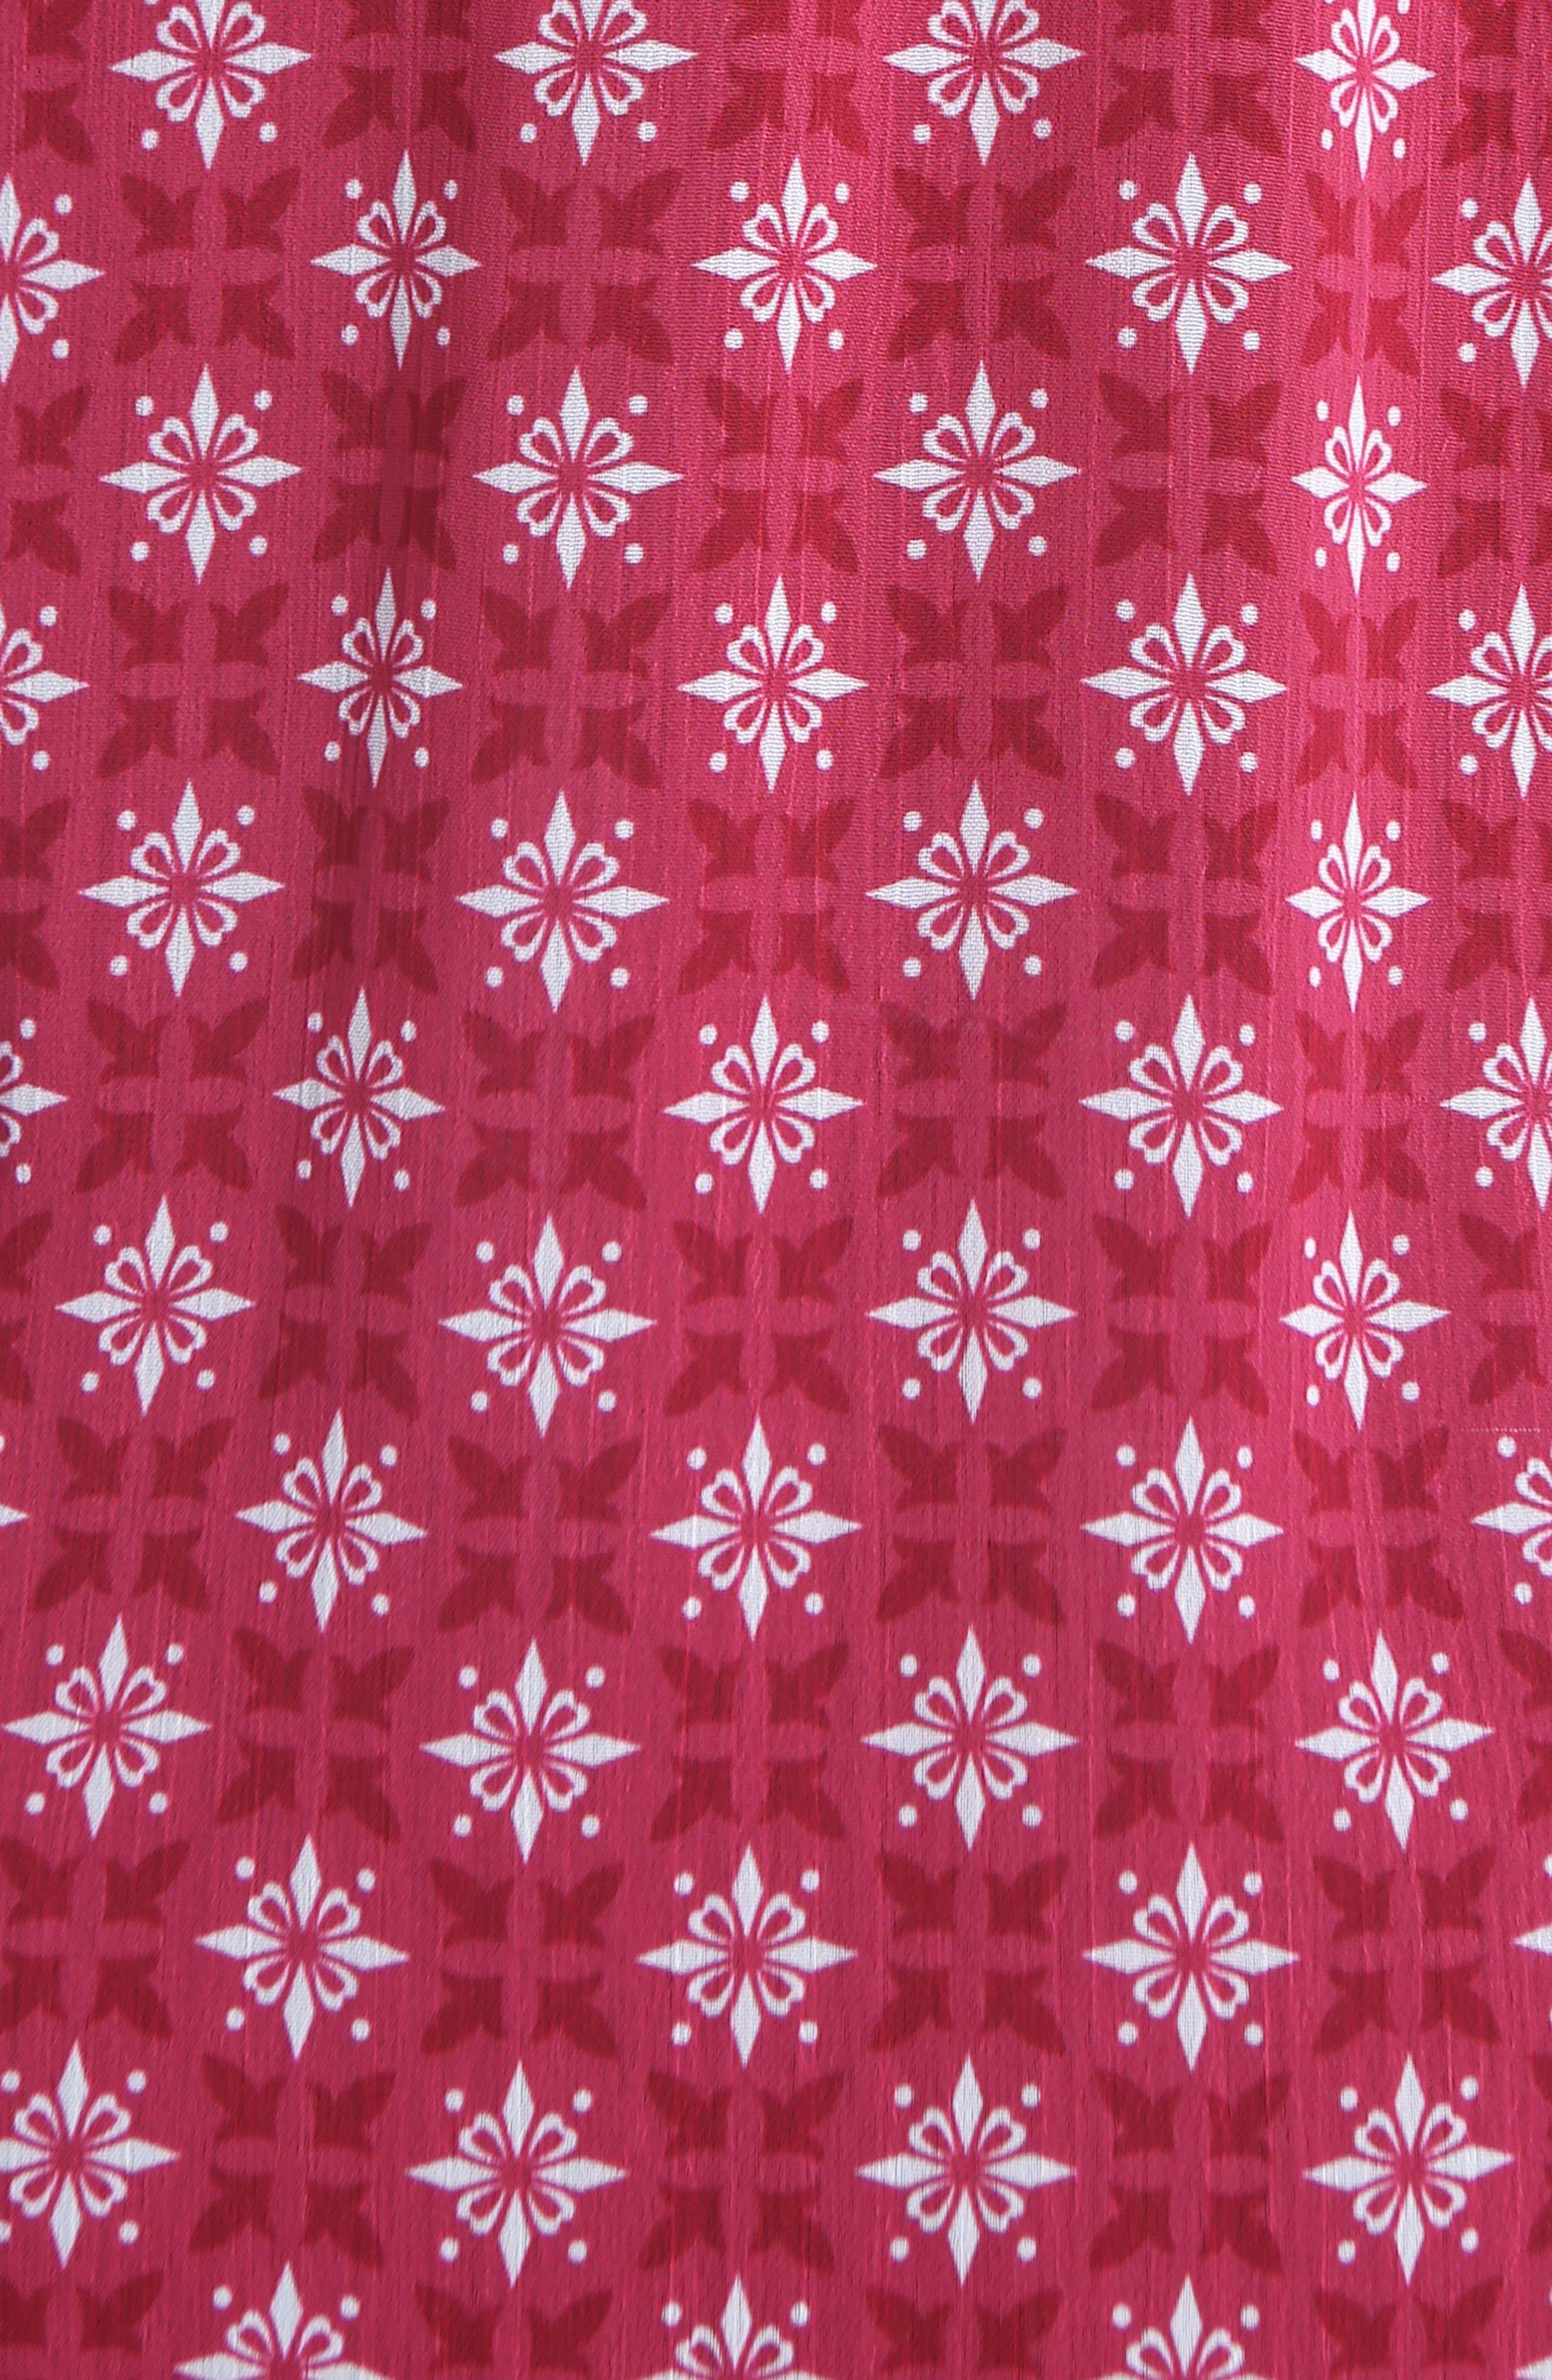 Jasmine Top,                             Alternate thumbnail 4, color,                             Pink 2